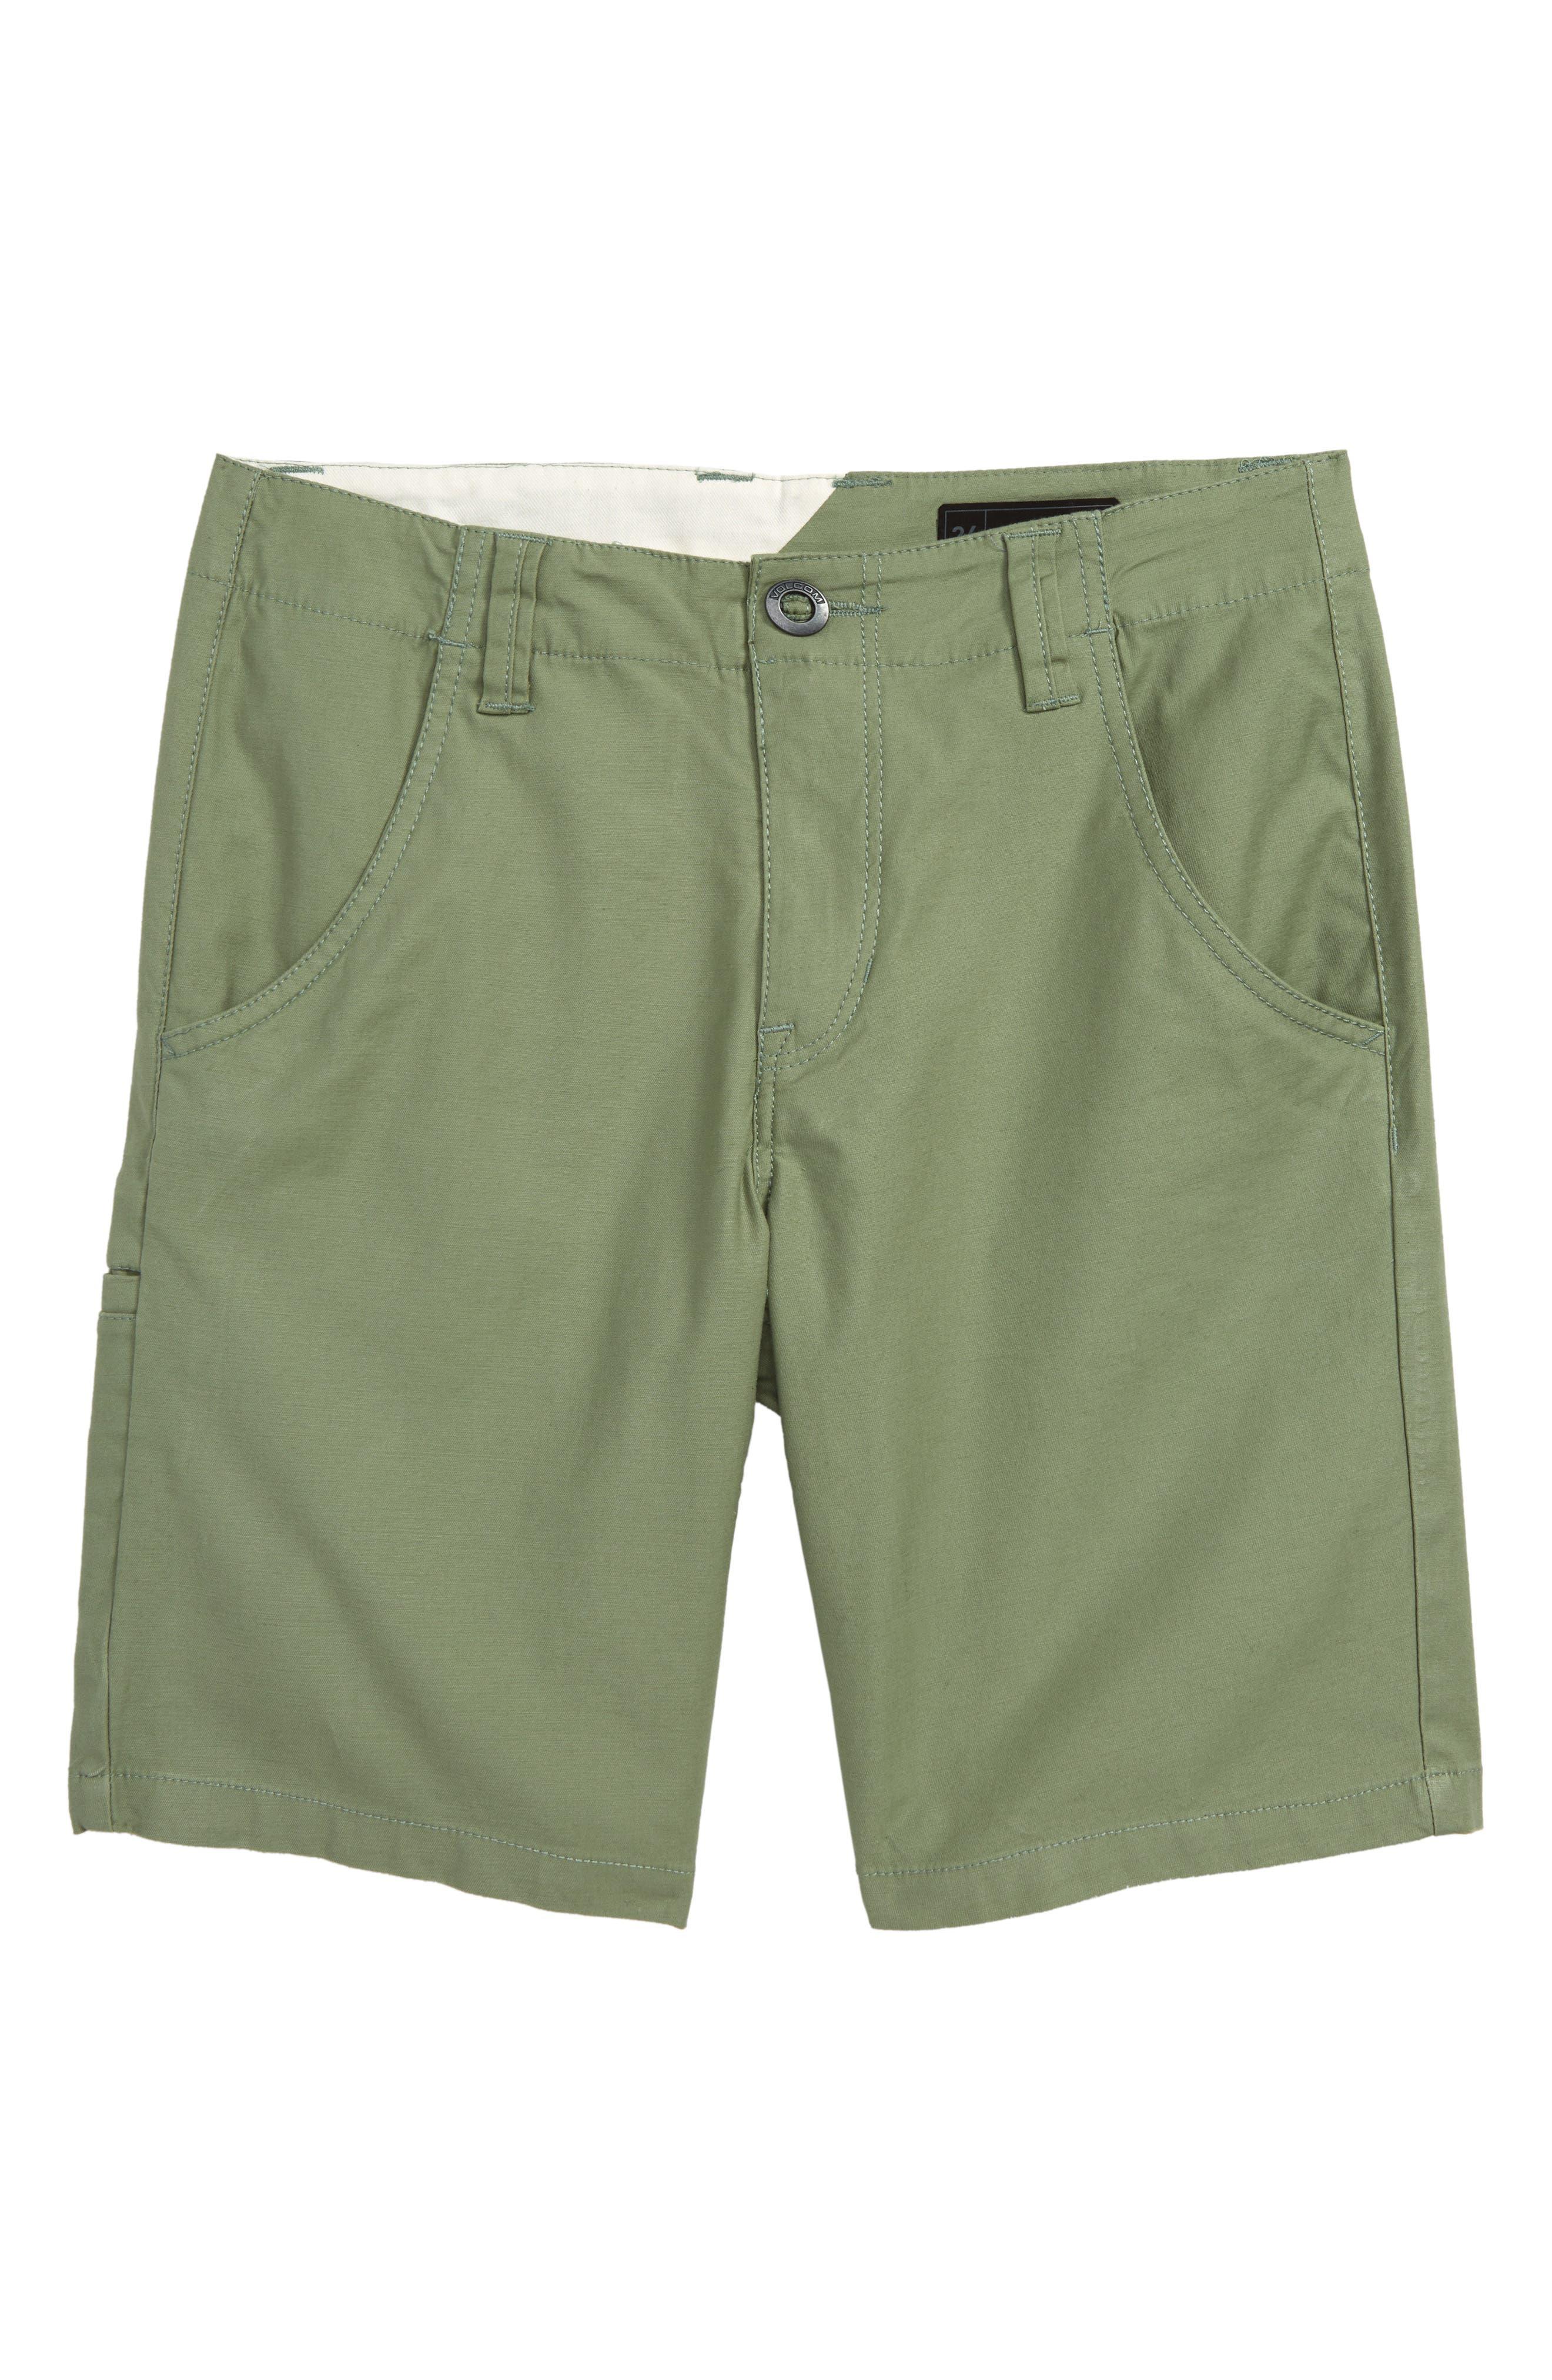 VOLCOM, Riser Shorts, Main thumbnail 1, color, FADED ARMY